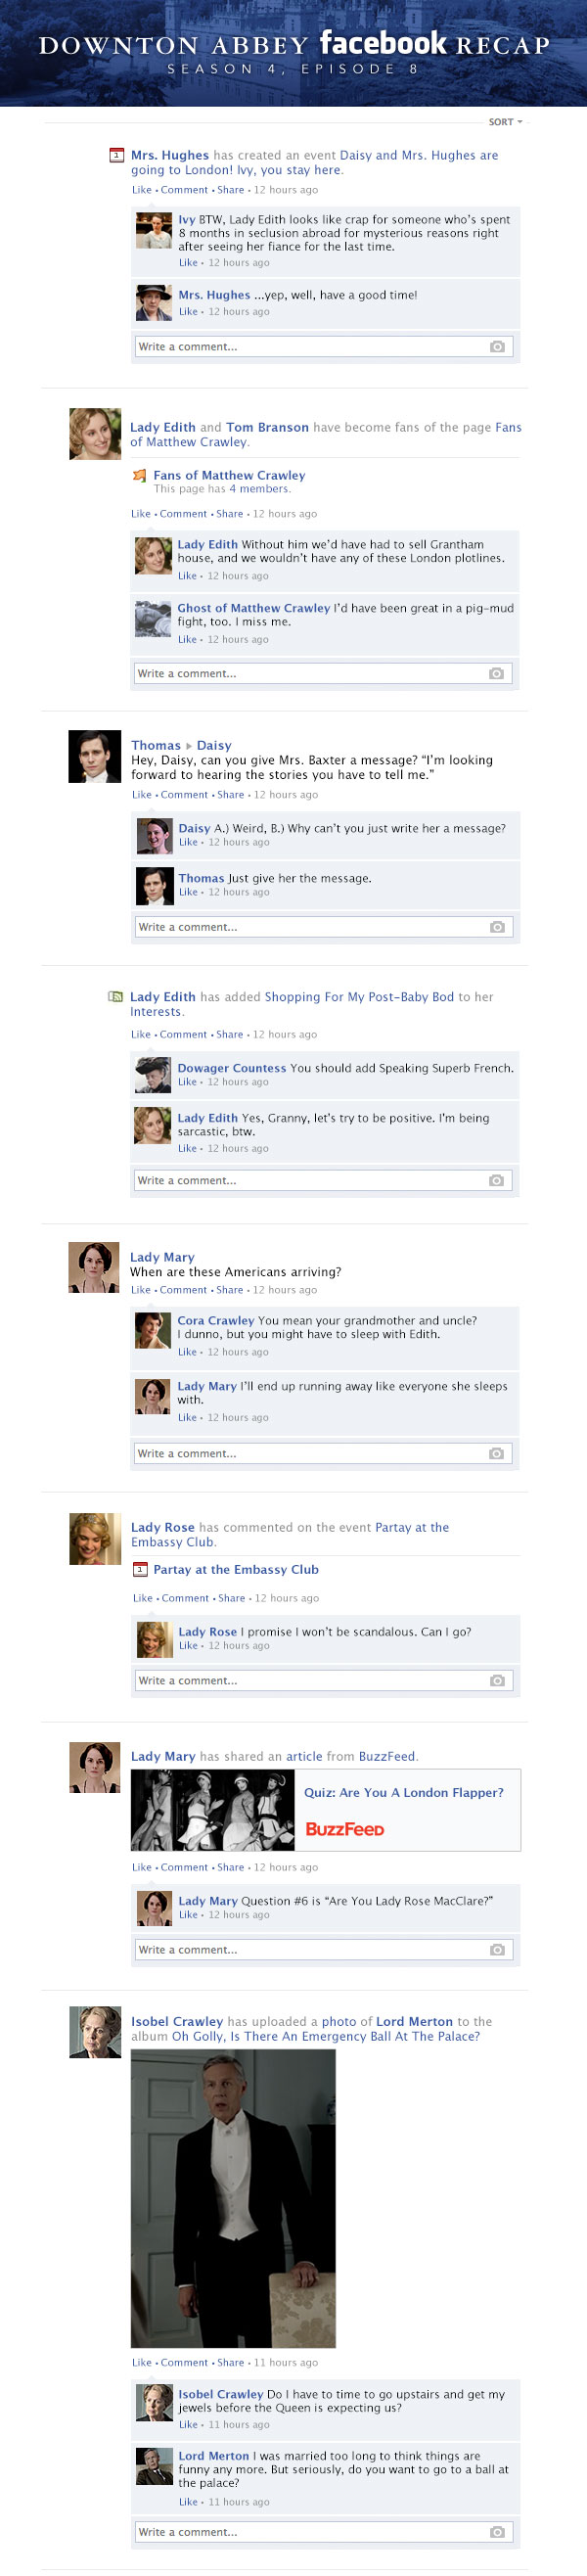 If 'Downton Abbey' took place entirely on Facebook - Season 4 Finale, 'The London Season' Recap